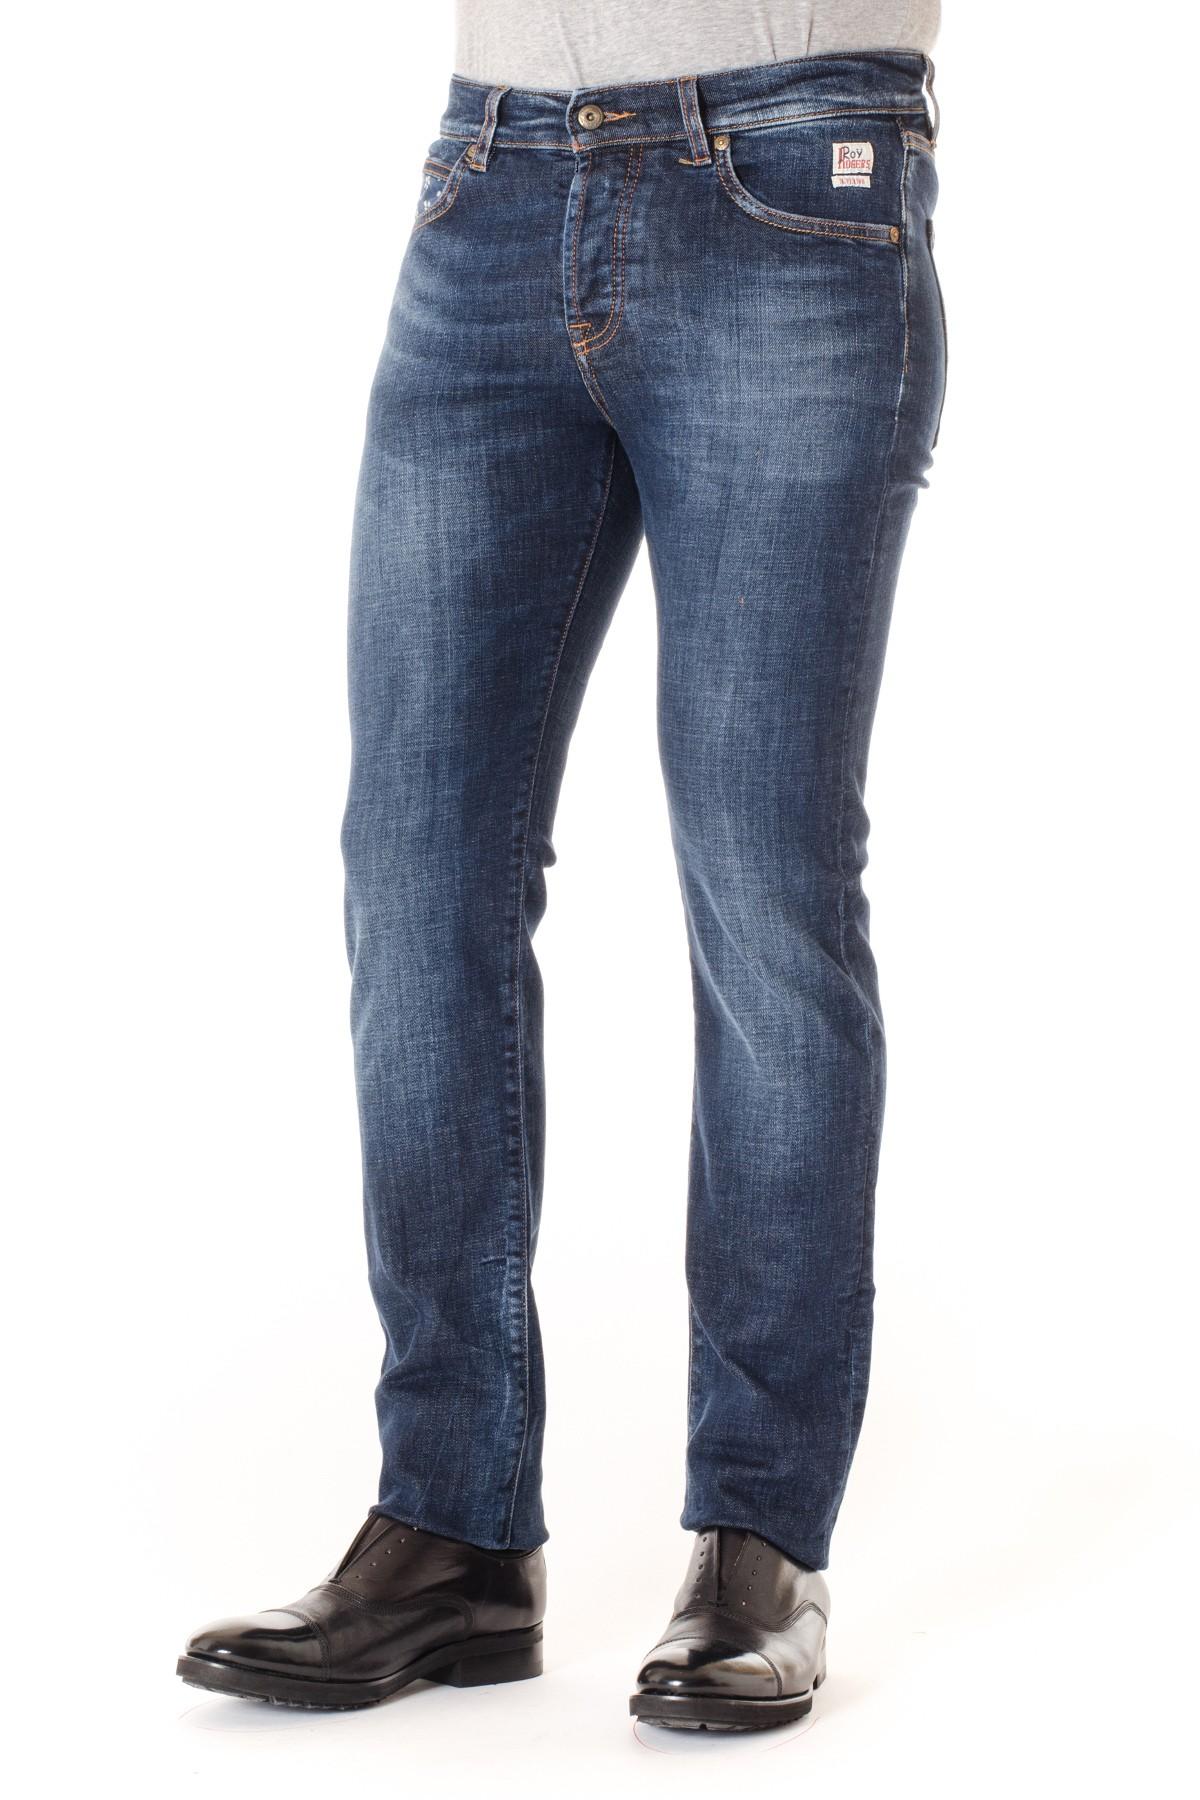 ROY ROGERu0026#39;S Jeans uomo A/I 16-17 denim KIMONO SASHA - Rione Fontana